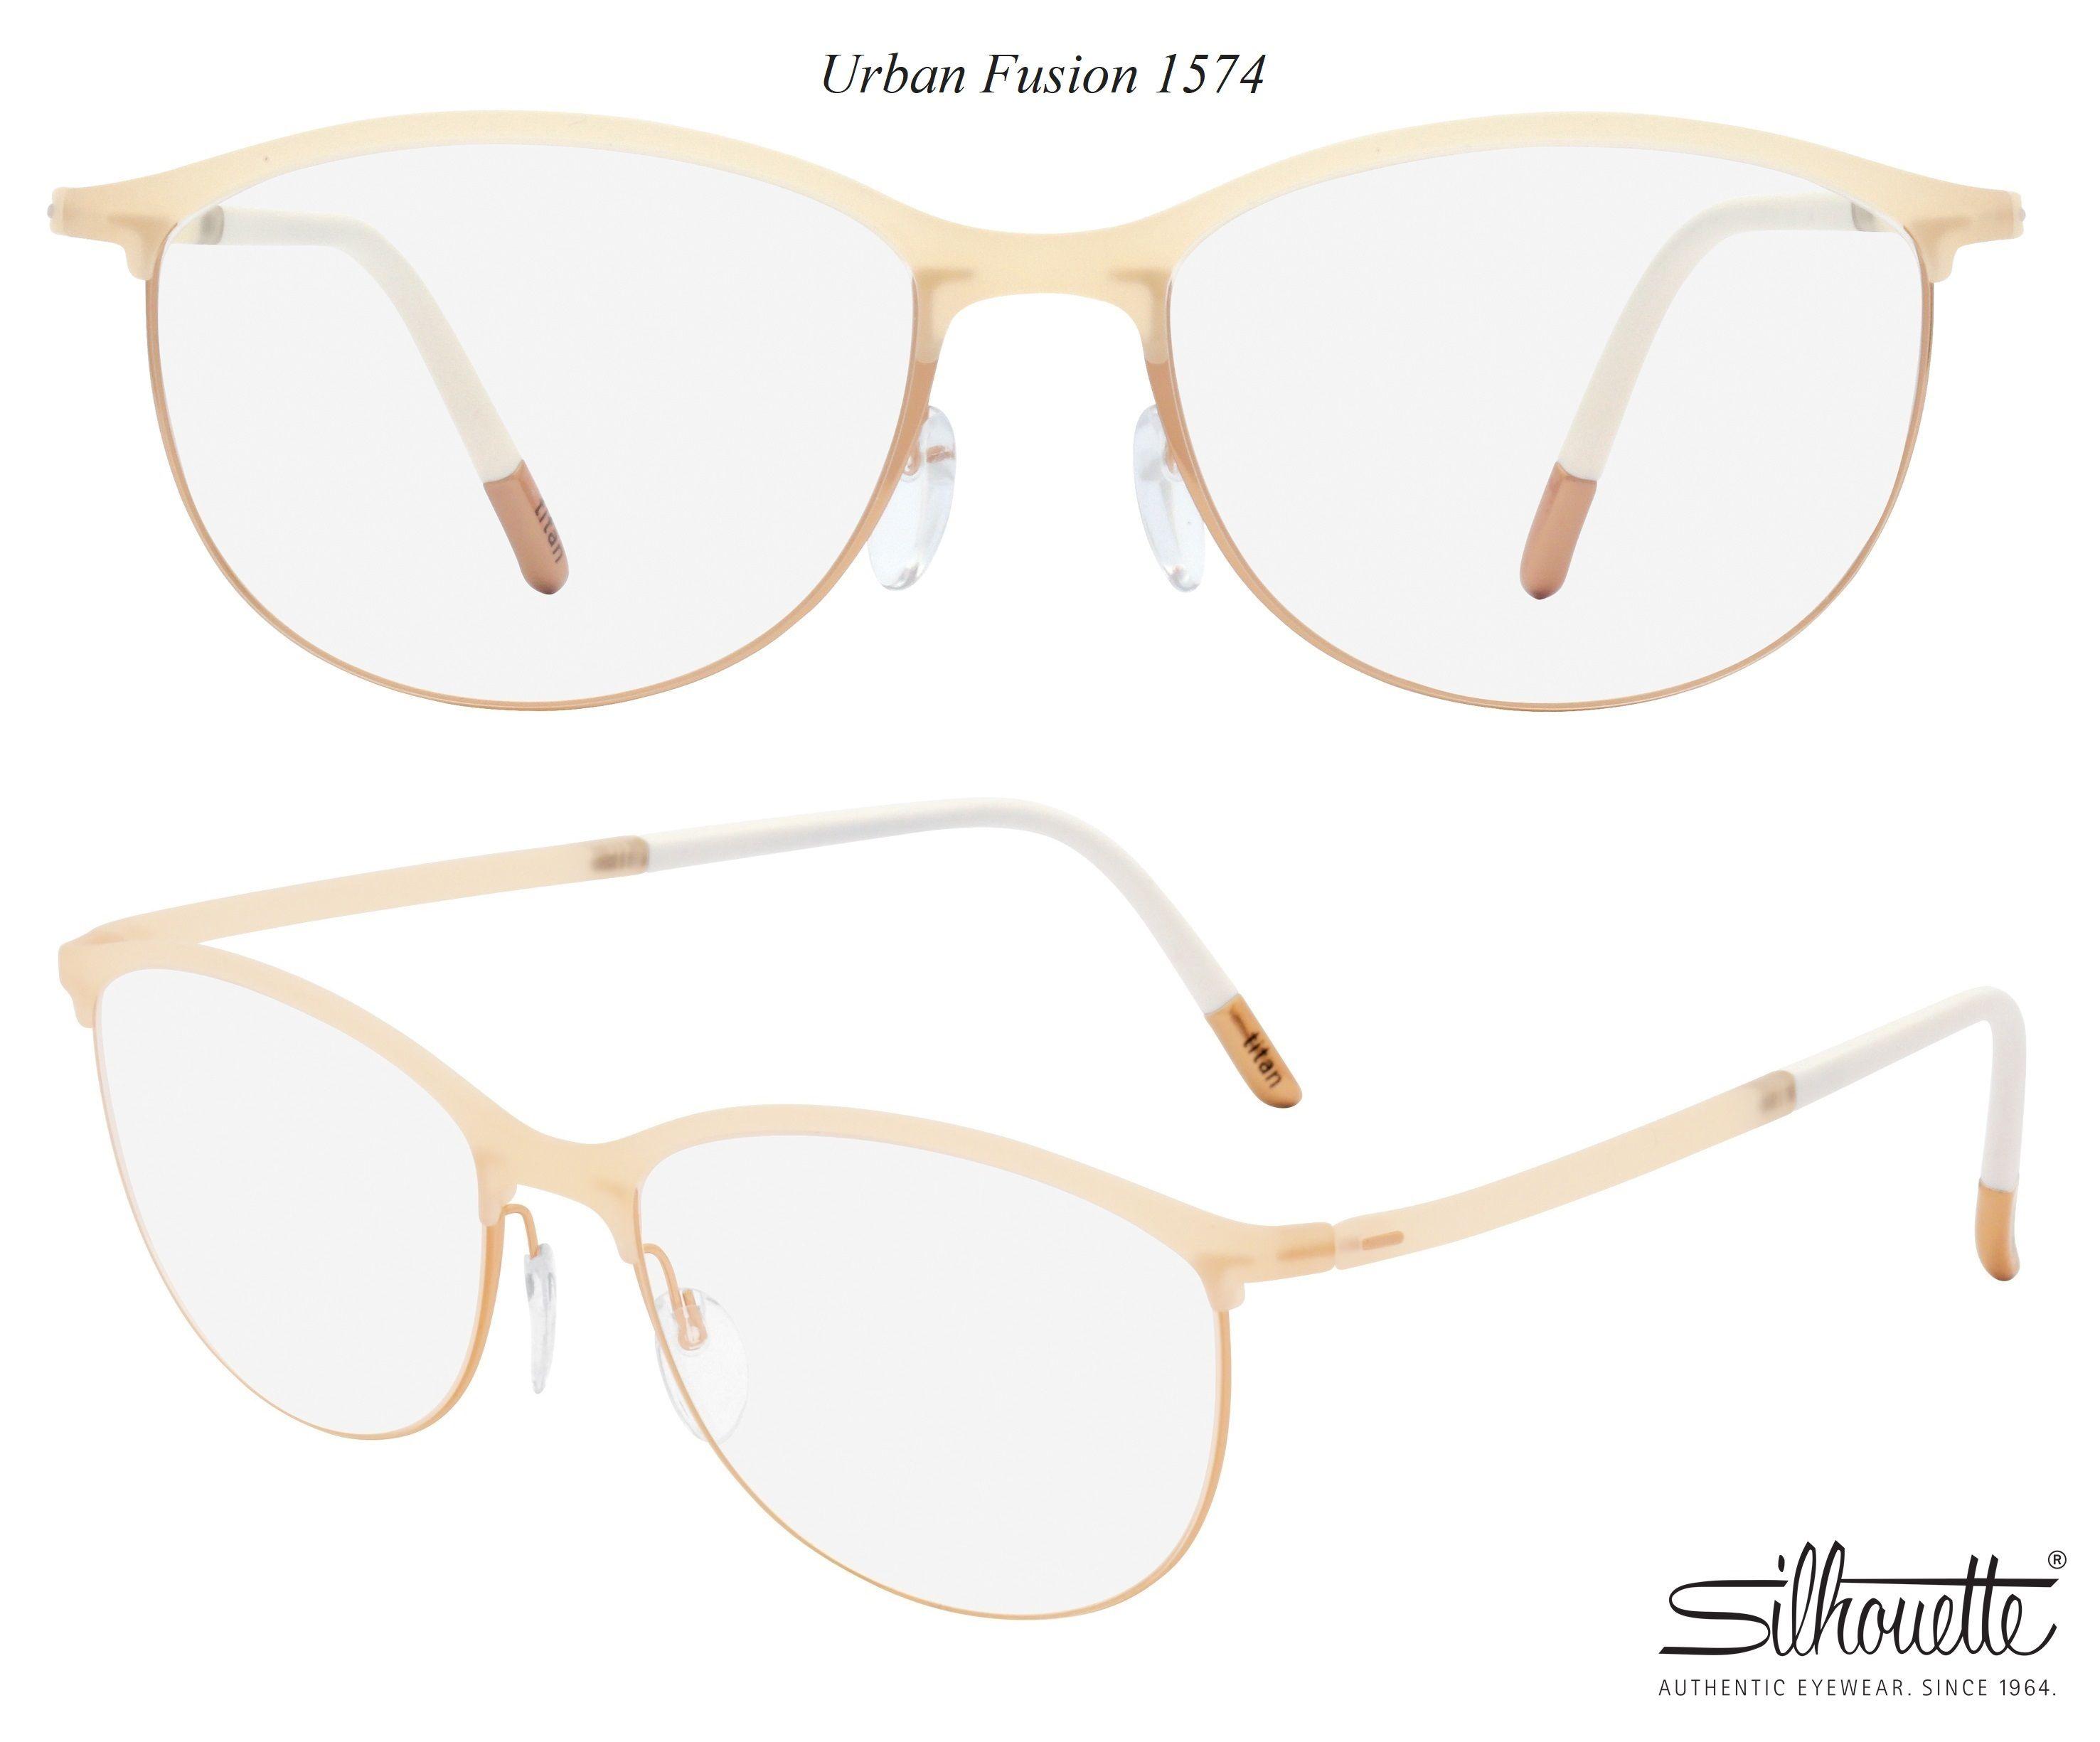 1d57f850c19c1 Silhouette Urban Fusion Fullrim 1575 20-6056 Ivory Eyeglasses ...